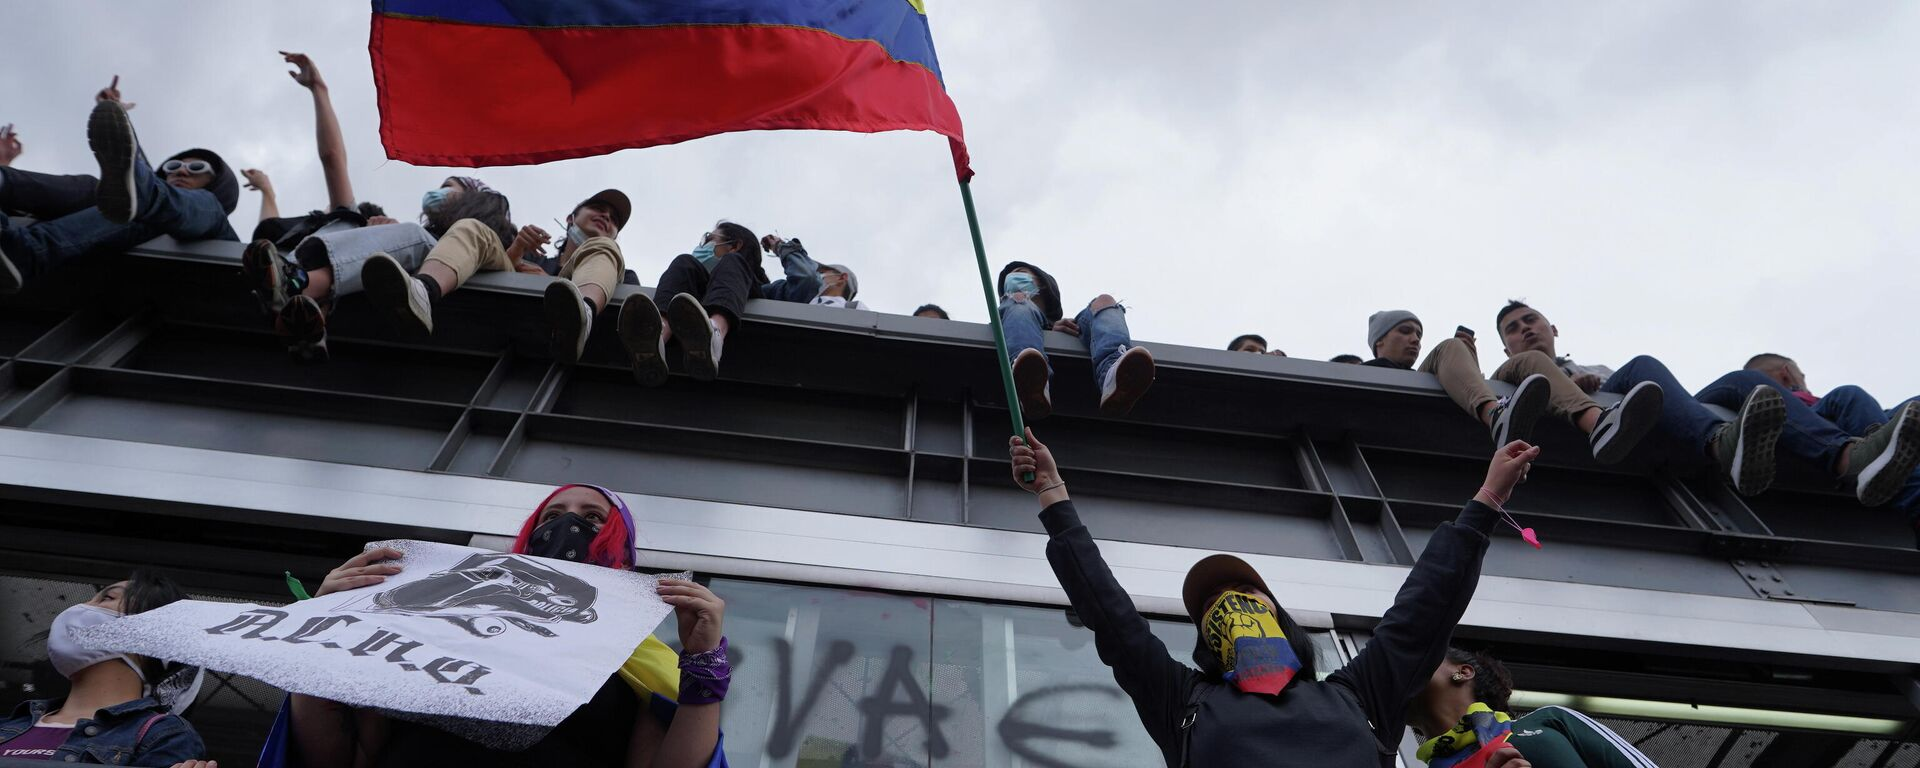 Protestas en Bogotá, Colombia - Sputnik Mundo, 1920, 15.05.2021